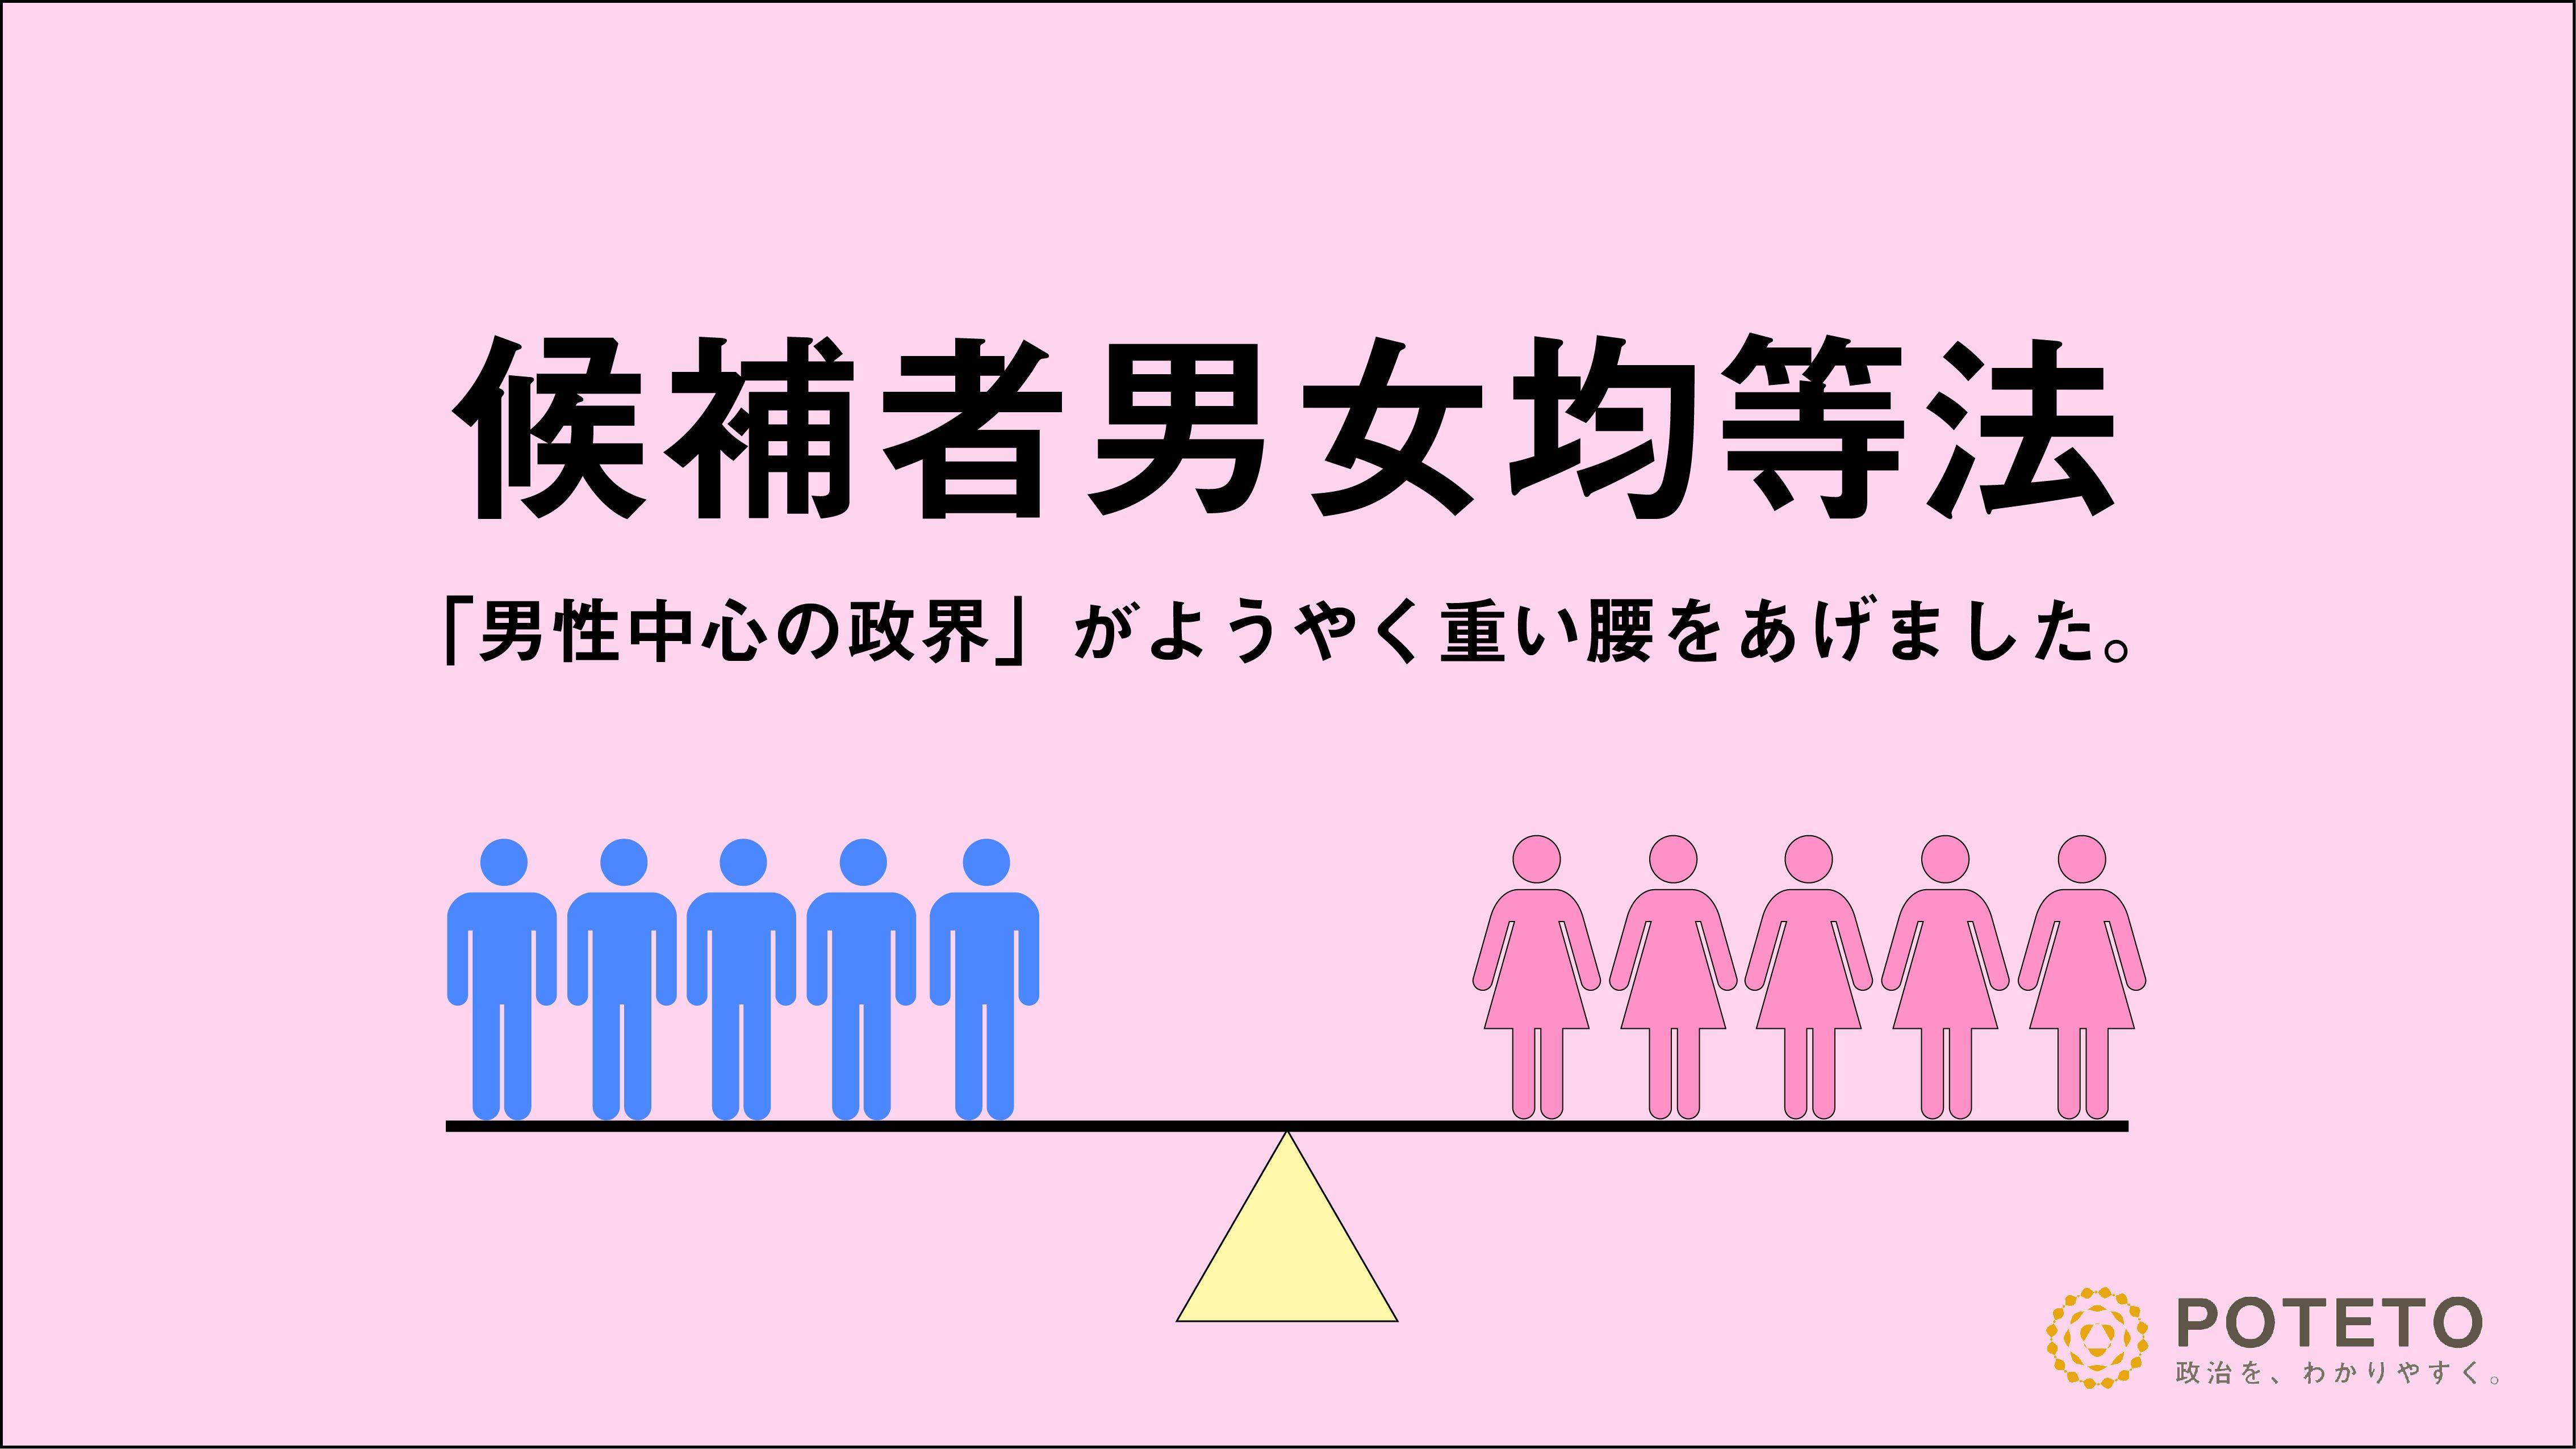 cda76f5f223515959ef1c354b488957b - 「男性中心」の政界が、変わりはじめる?<br>候補者男女均等法とは。